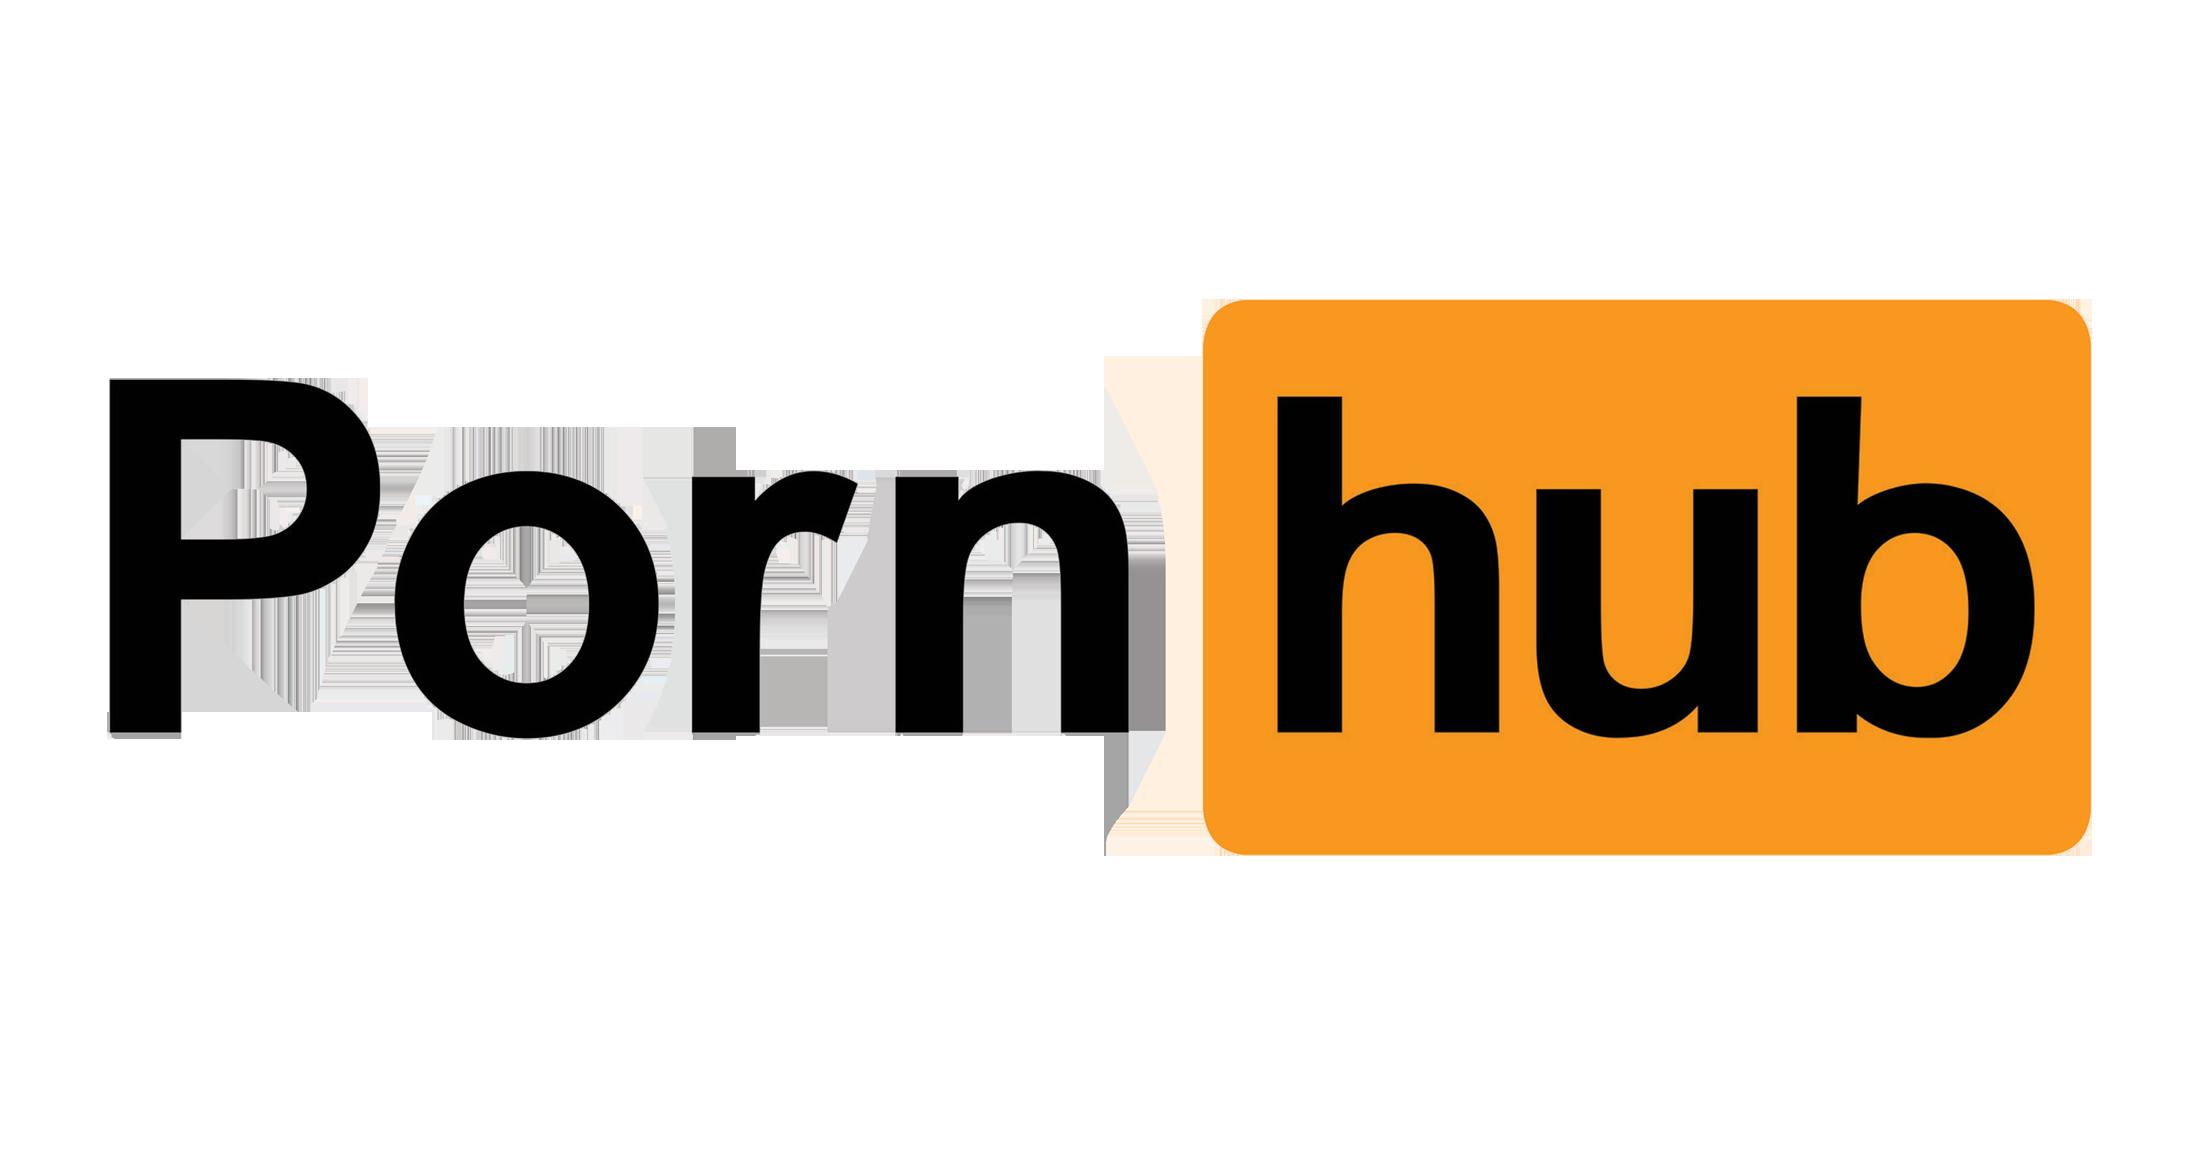 PornHub Logo, PornHub Symbol, Meaning, History and Evolution